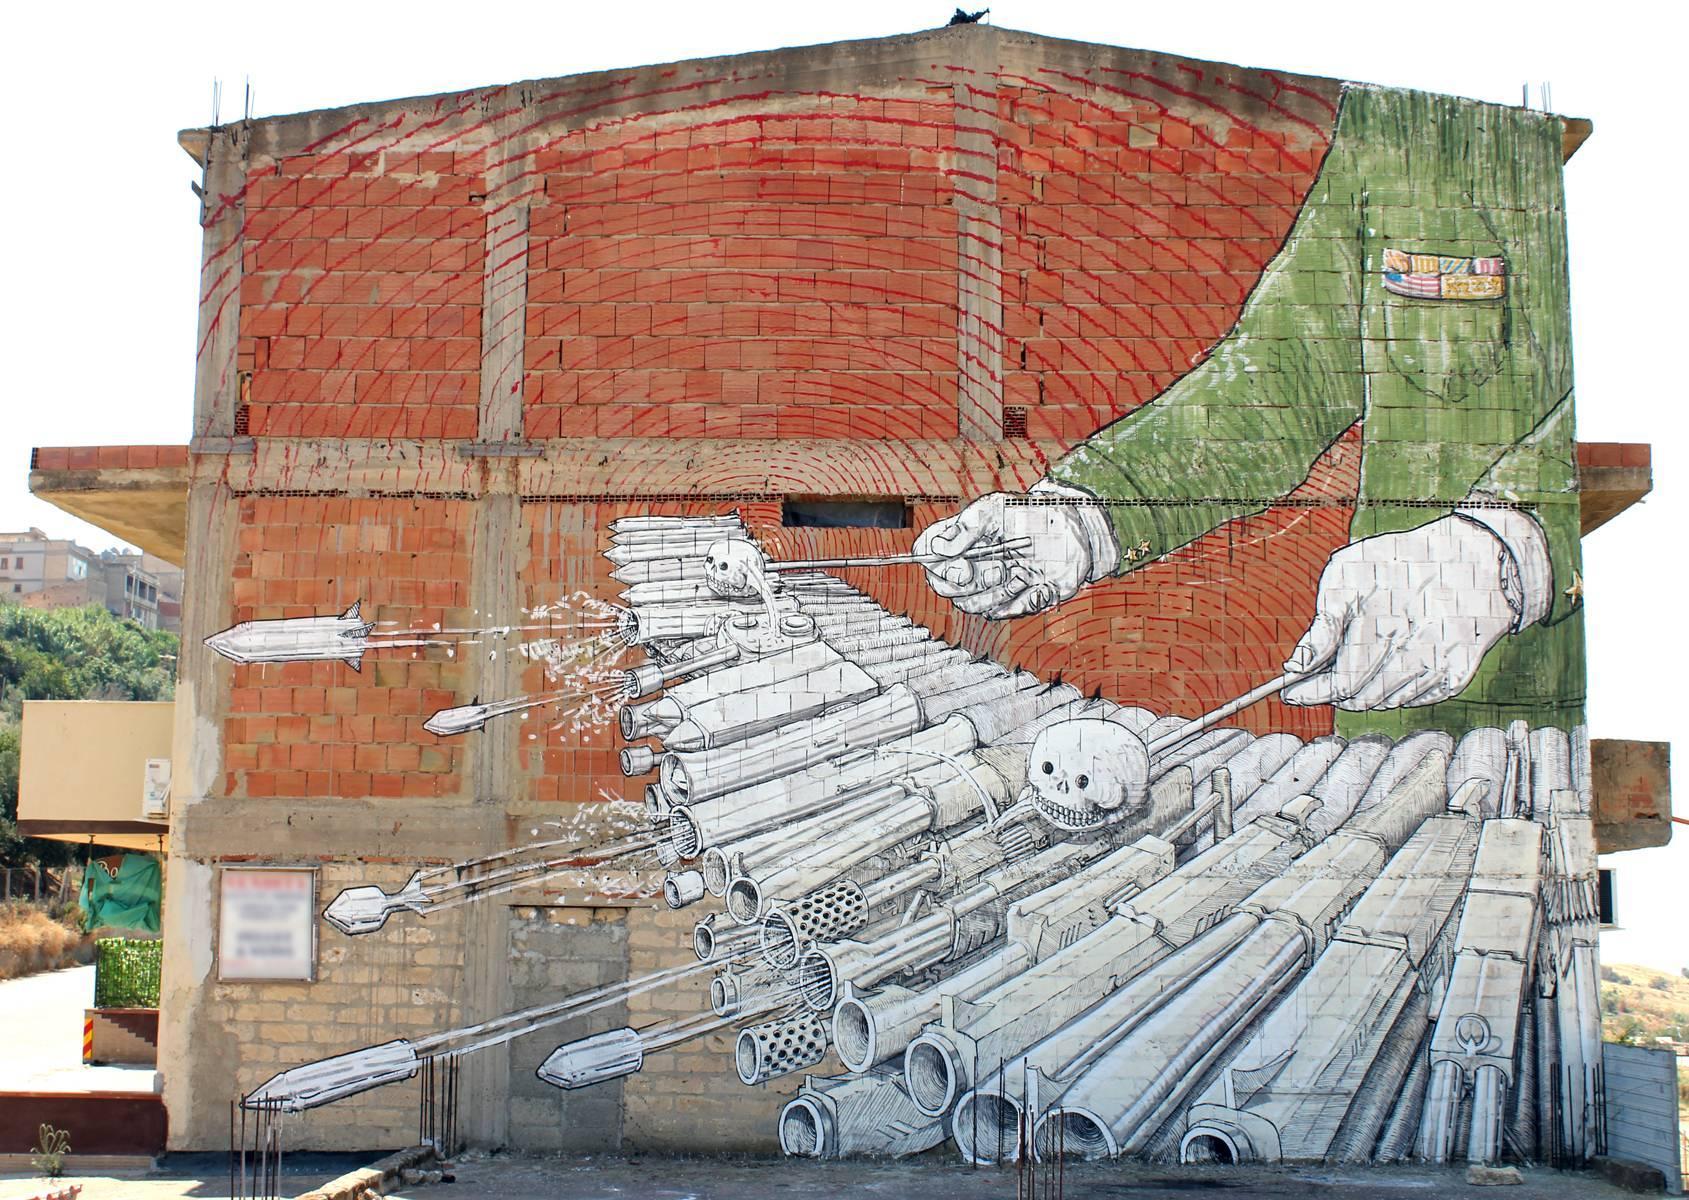 blu-grafite-italia-arte-urbana-donisio-arte (5)